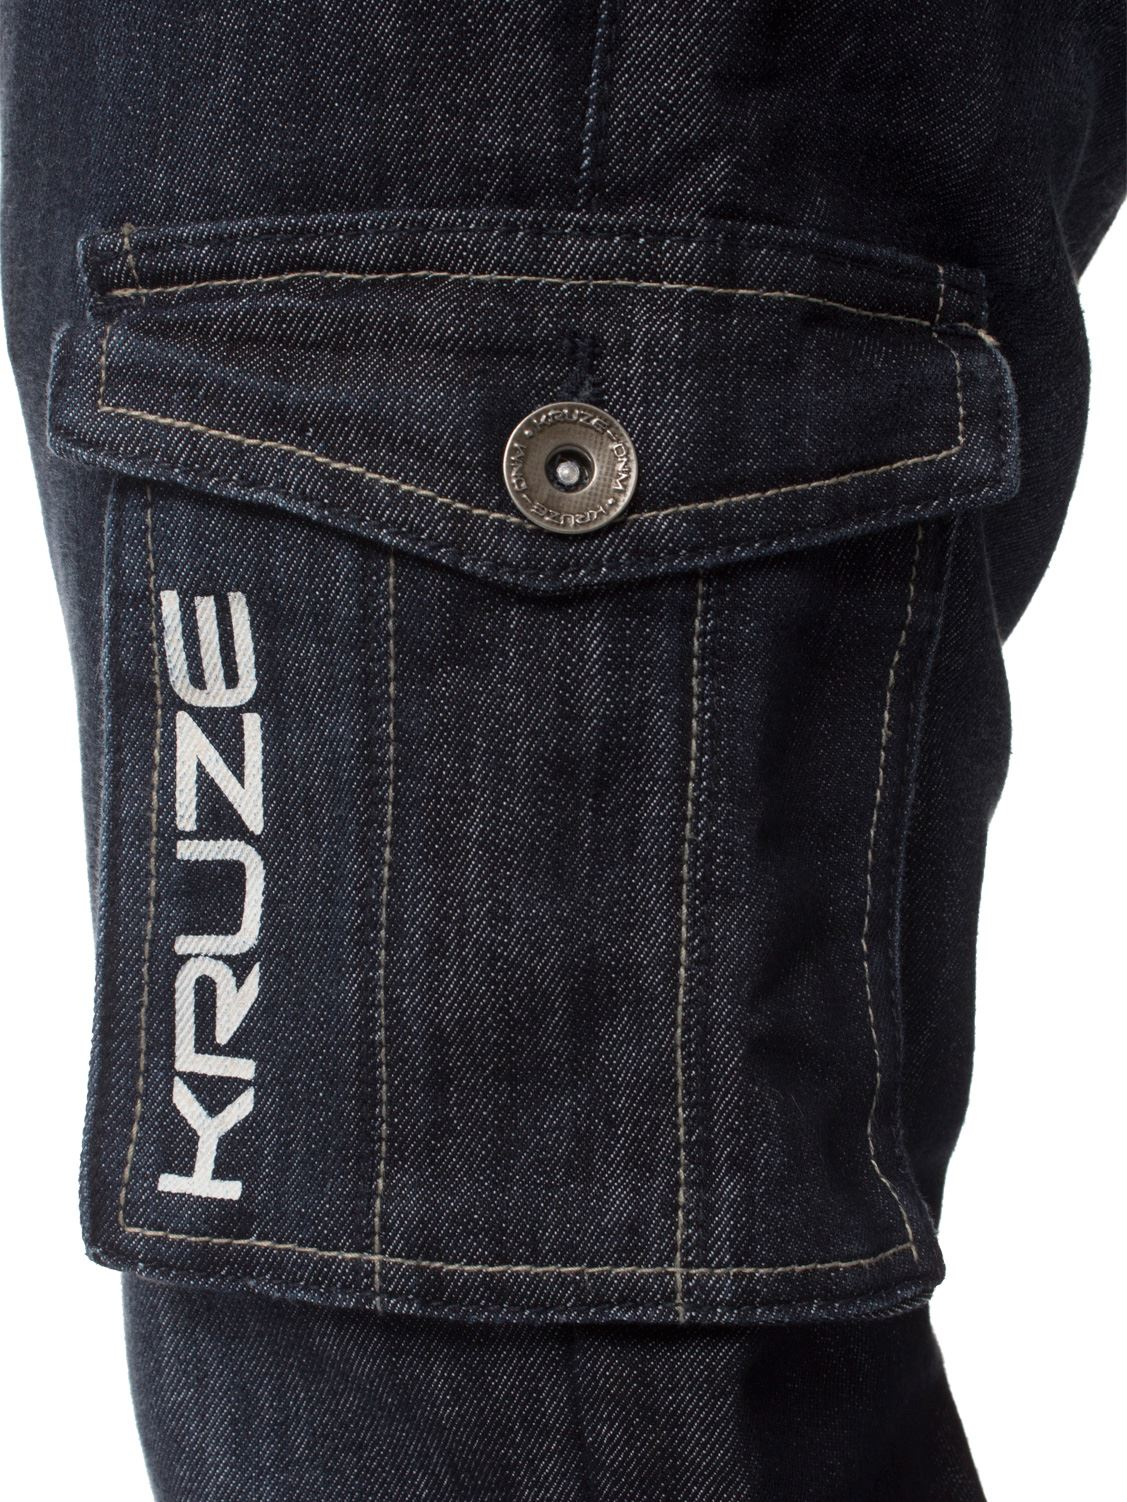 Grandes-jeans-para-hombre-de-combate-de-Kruze-Rey-Alto-Pierna-Cargo-Pantalones-Jeans-Pantalones miniatura 16